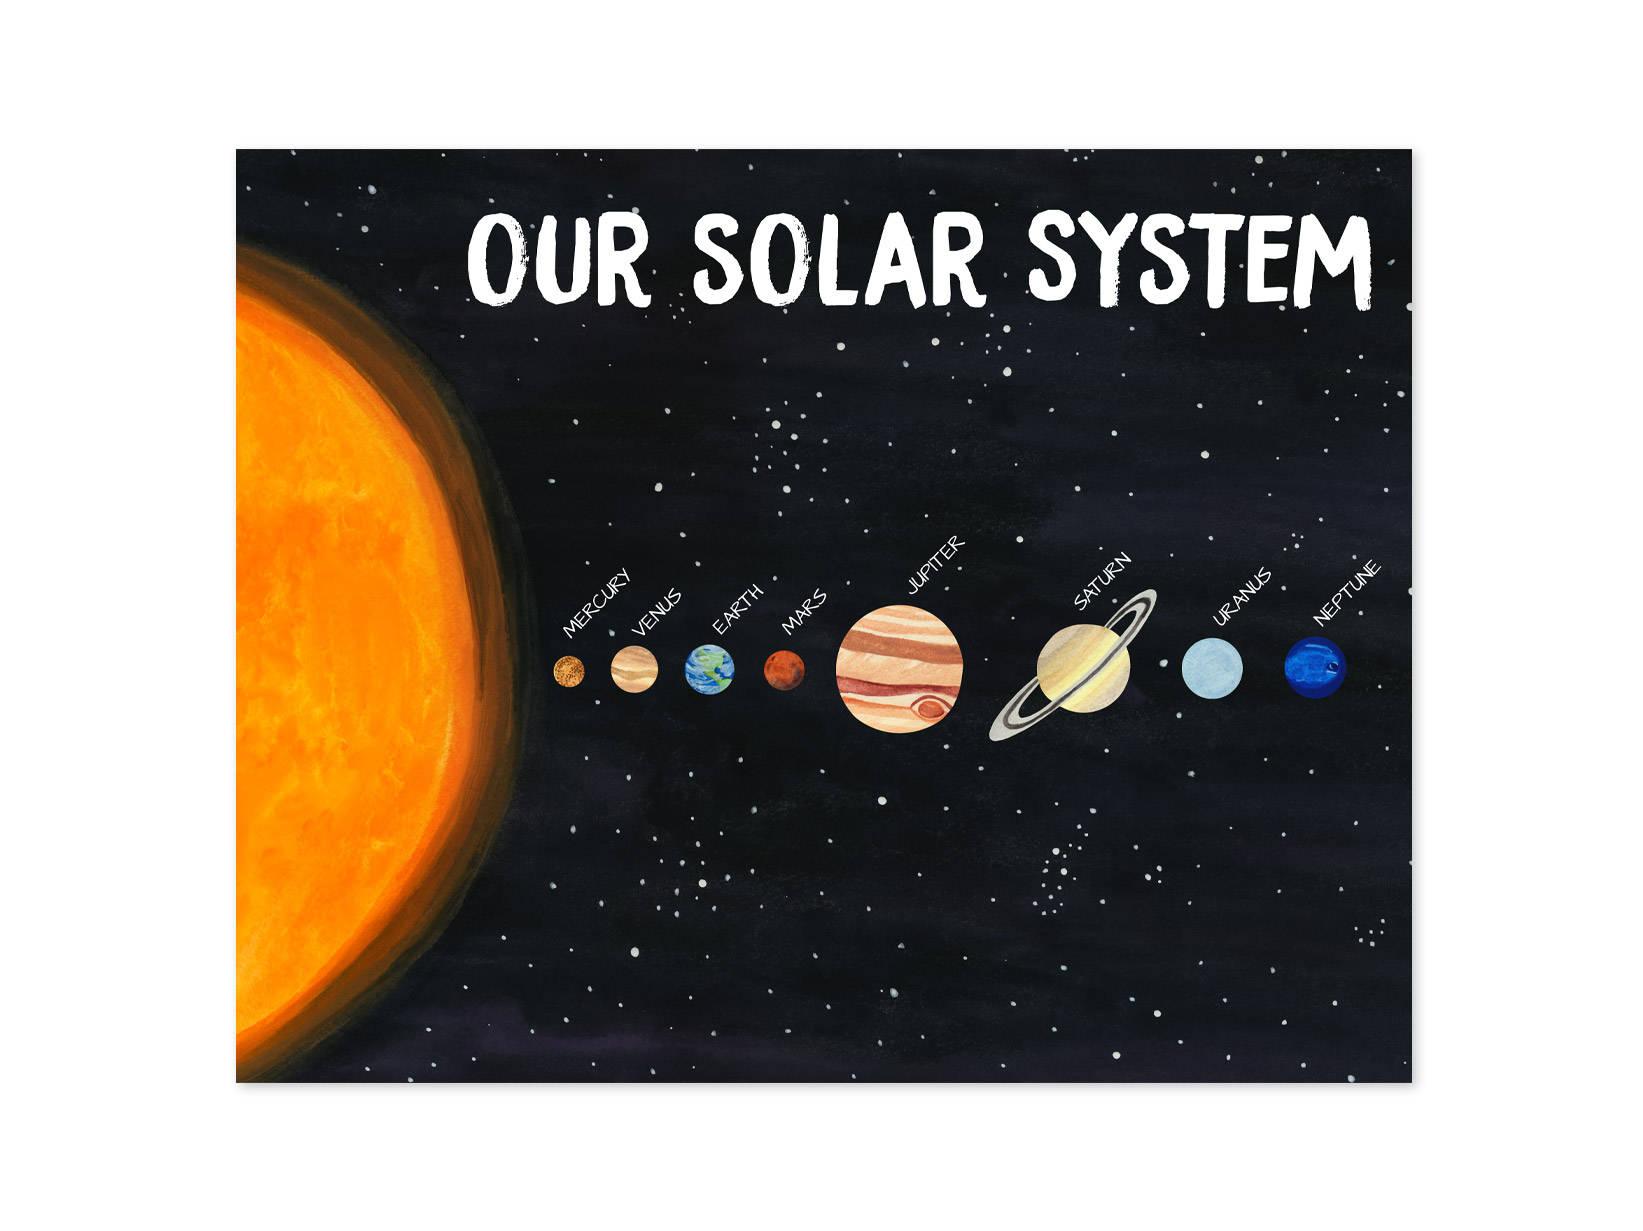 solar system three js - photo #43